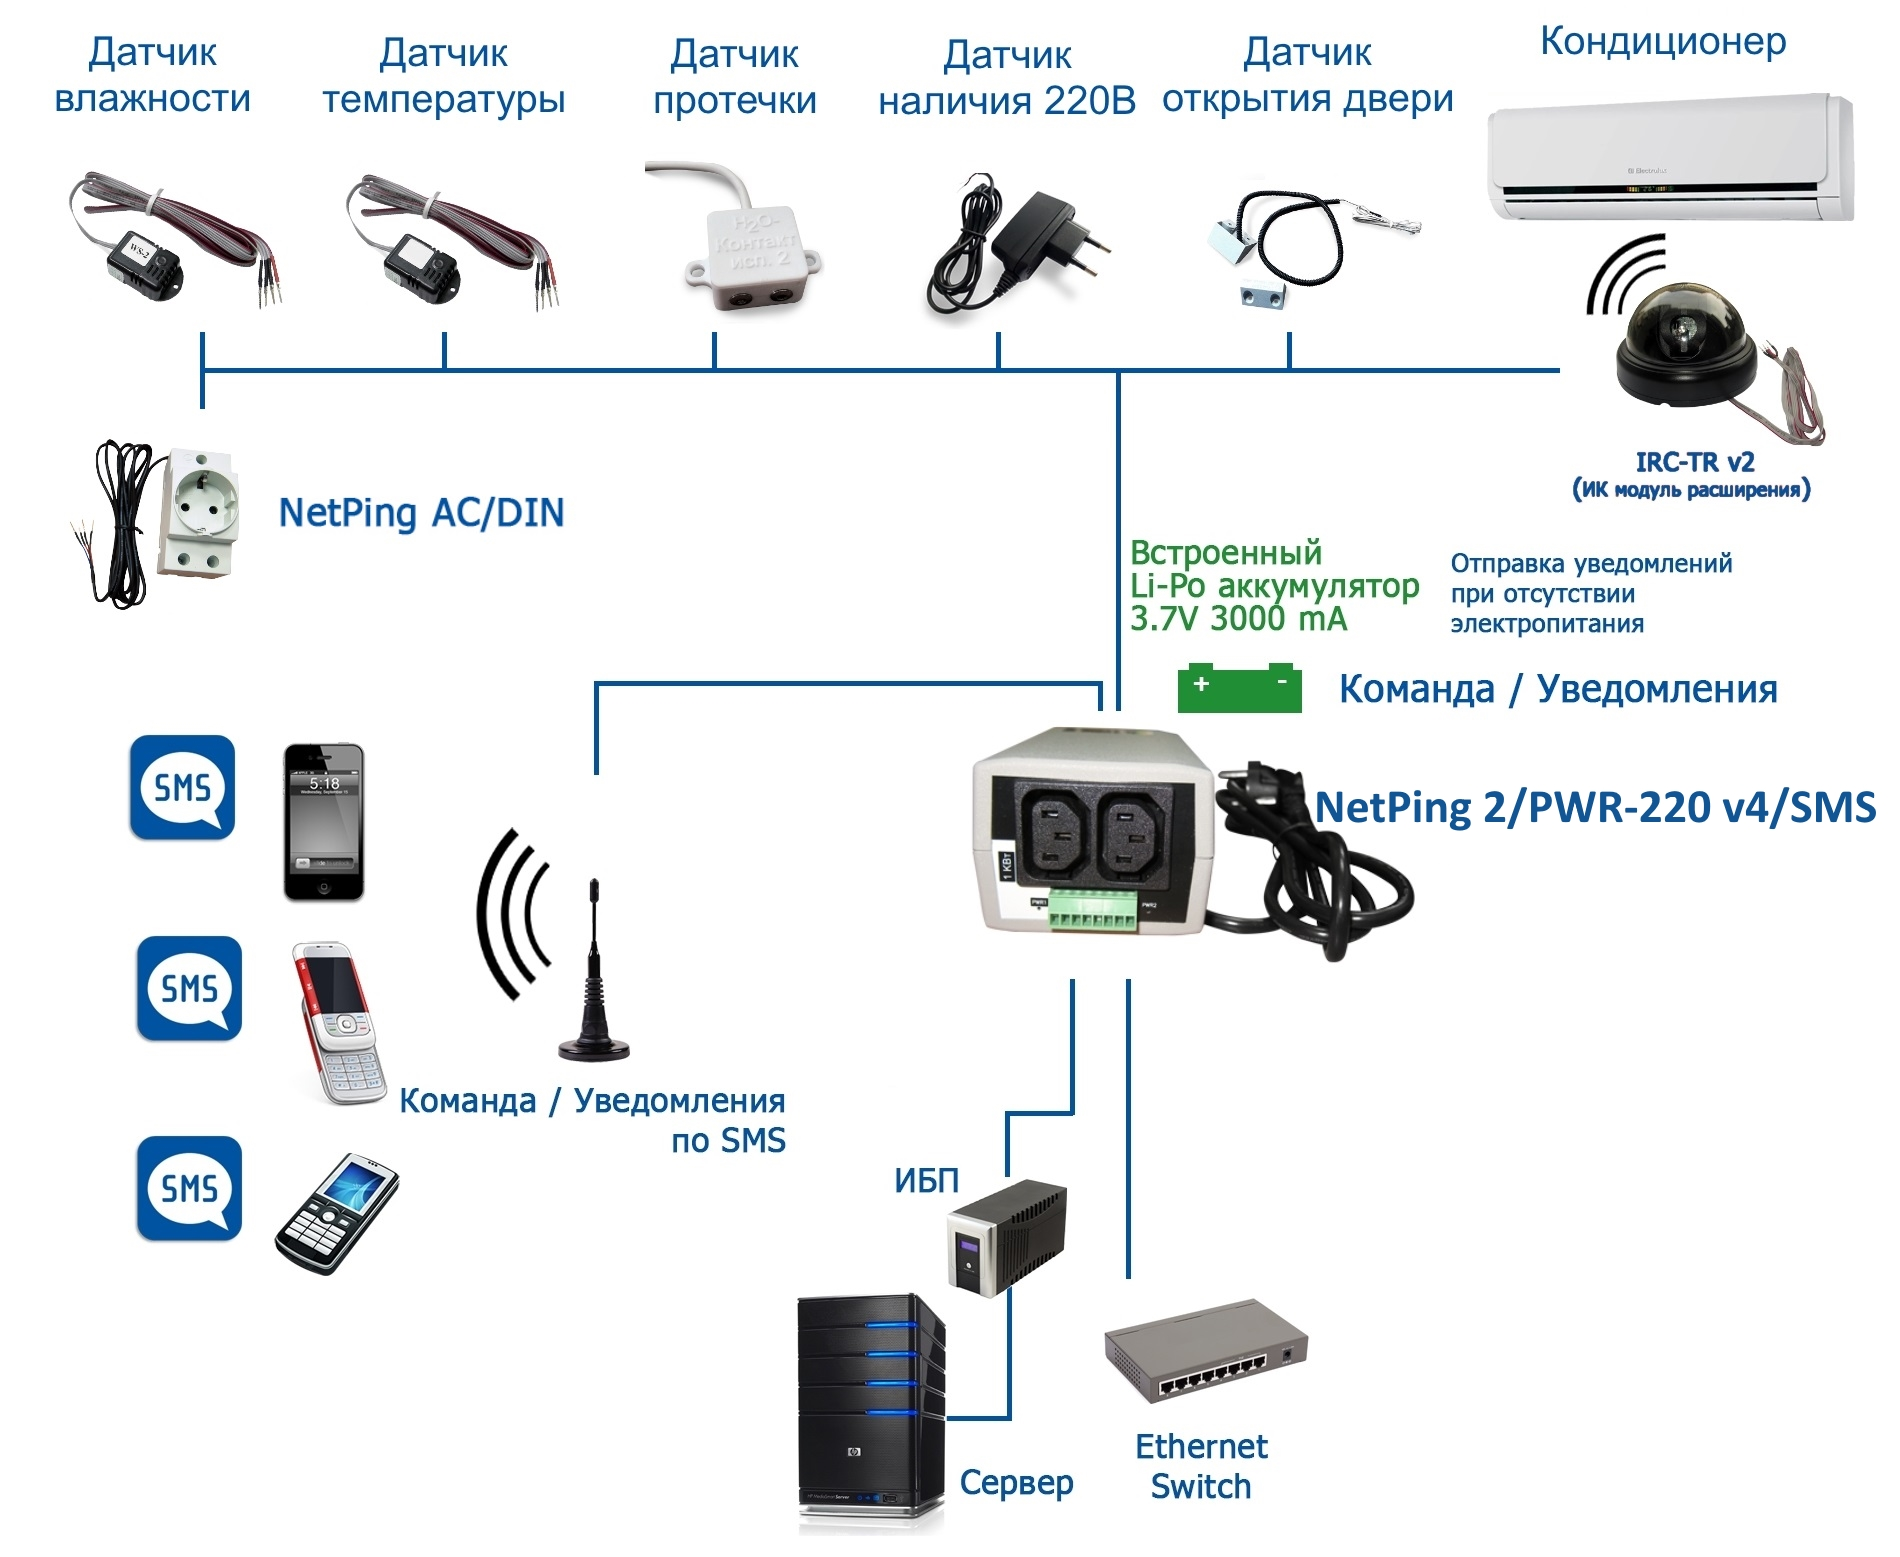 NetPing 2/PWR-220 v4/SMS - подключение датчиков